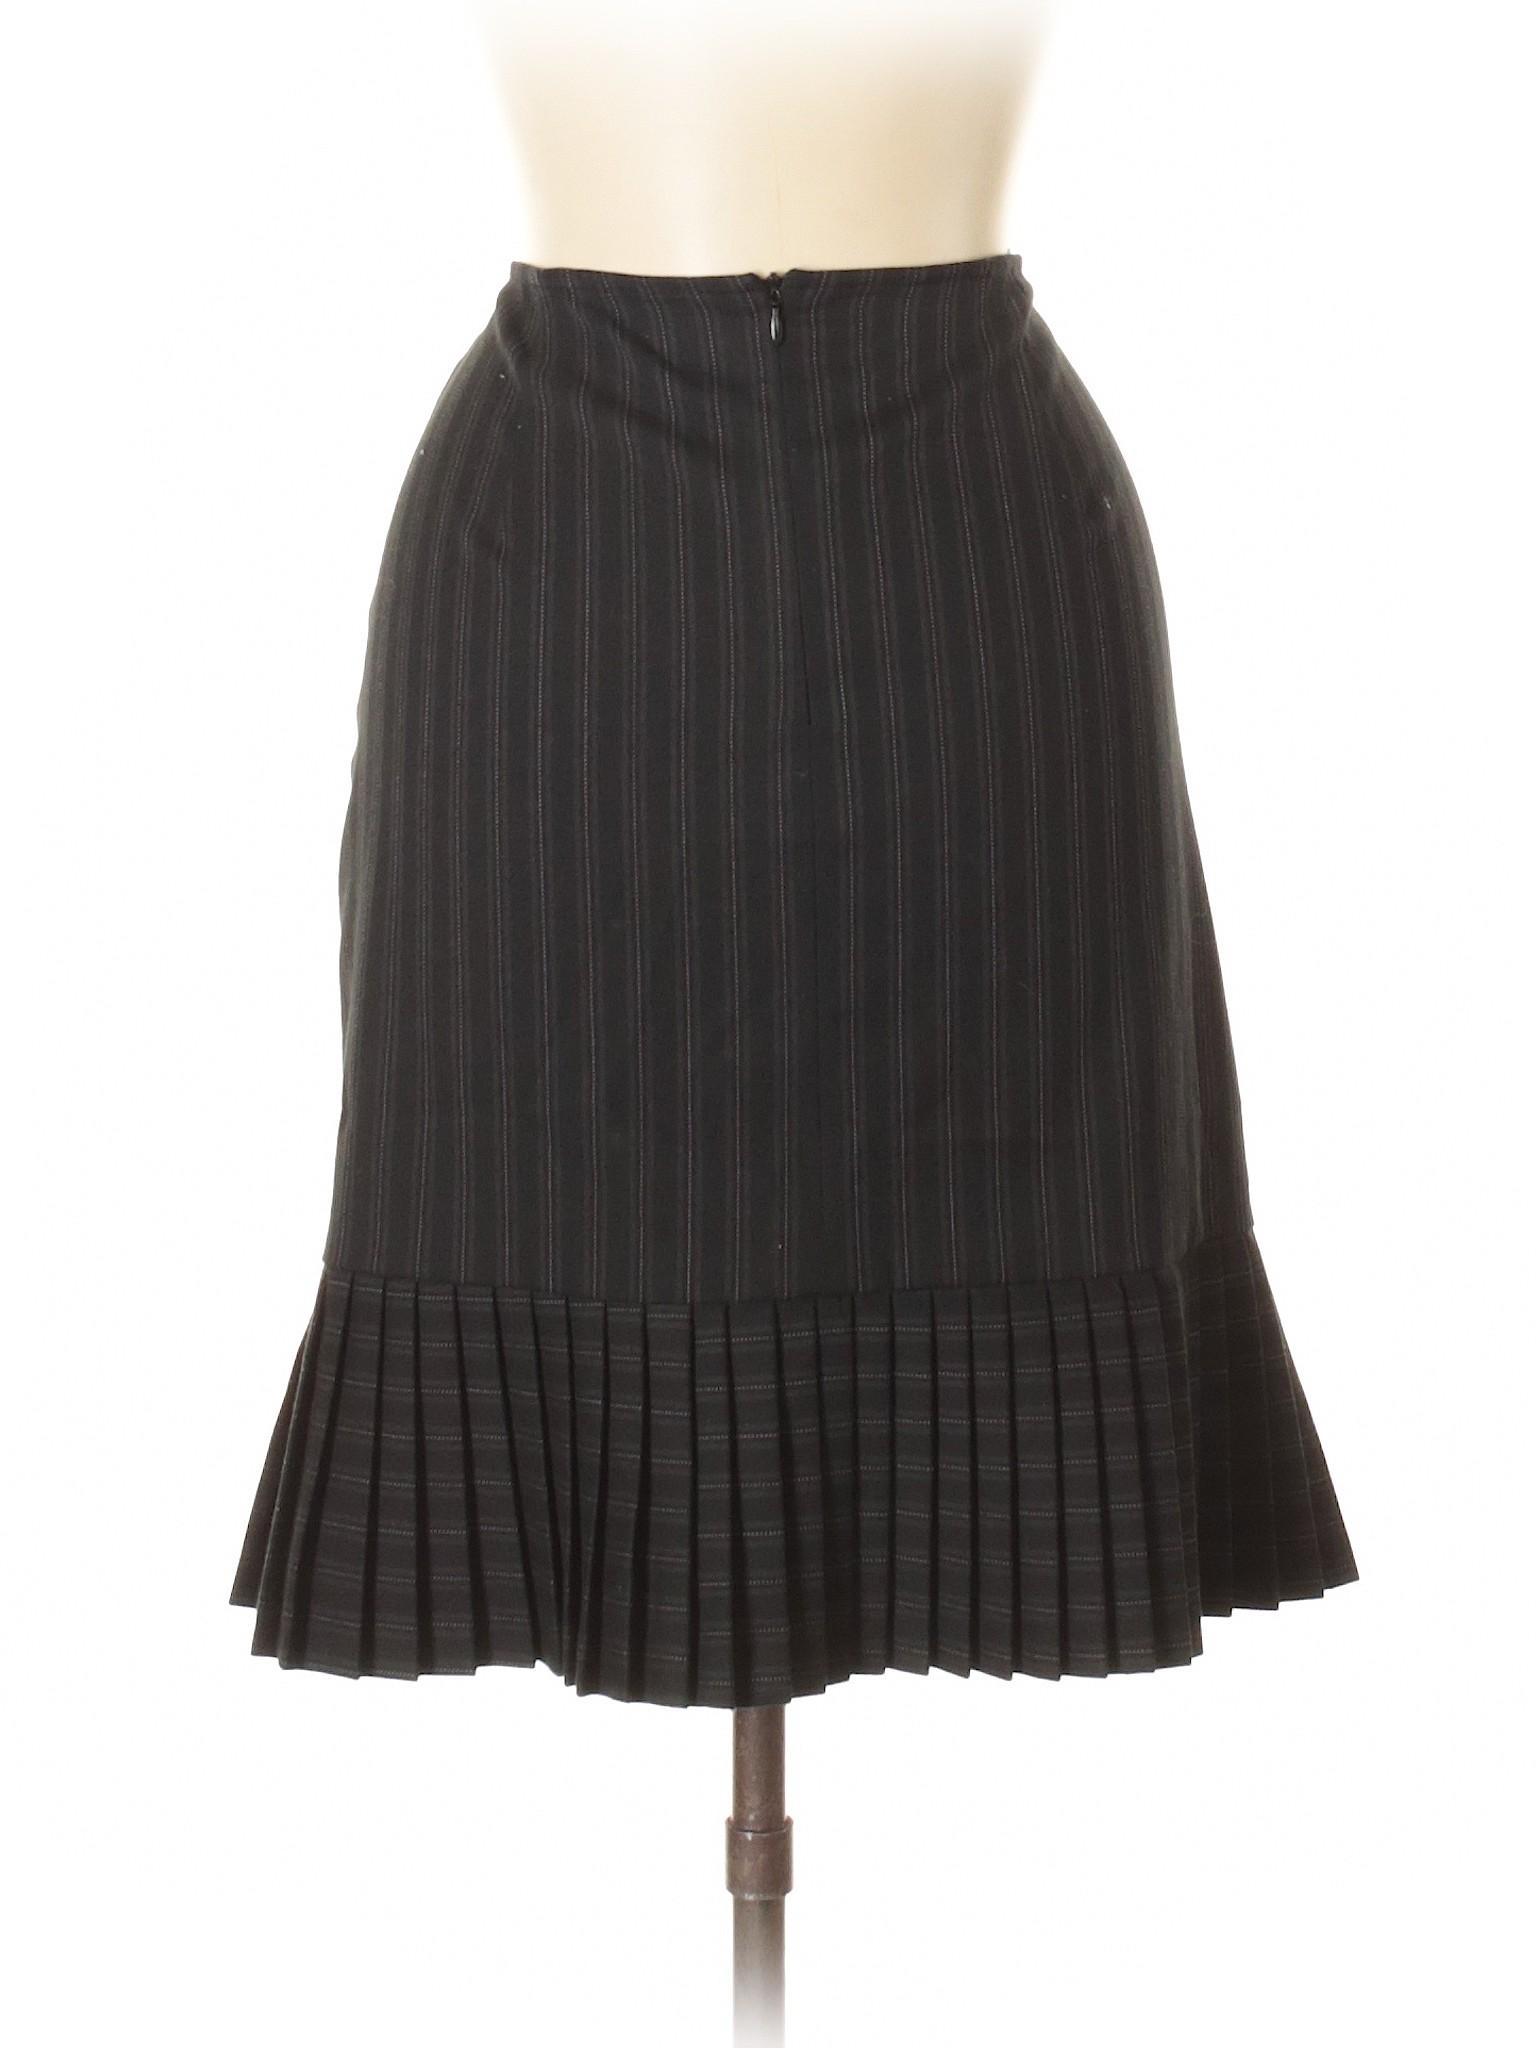 Casual Skirt Boutique Boutique Casual Skirt 0qHz8fp